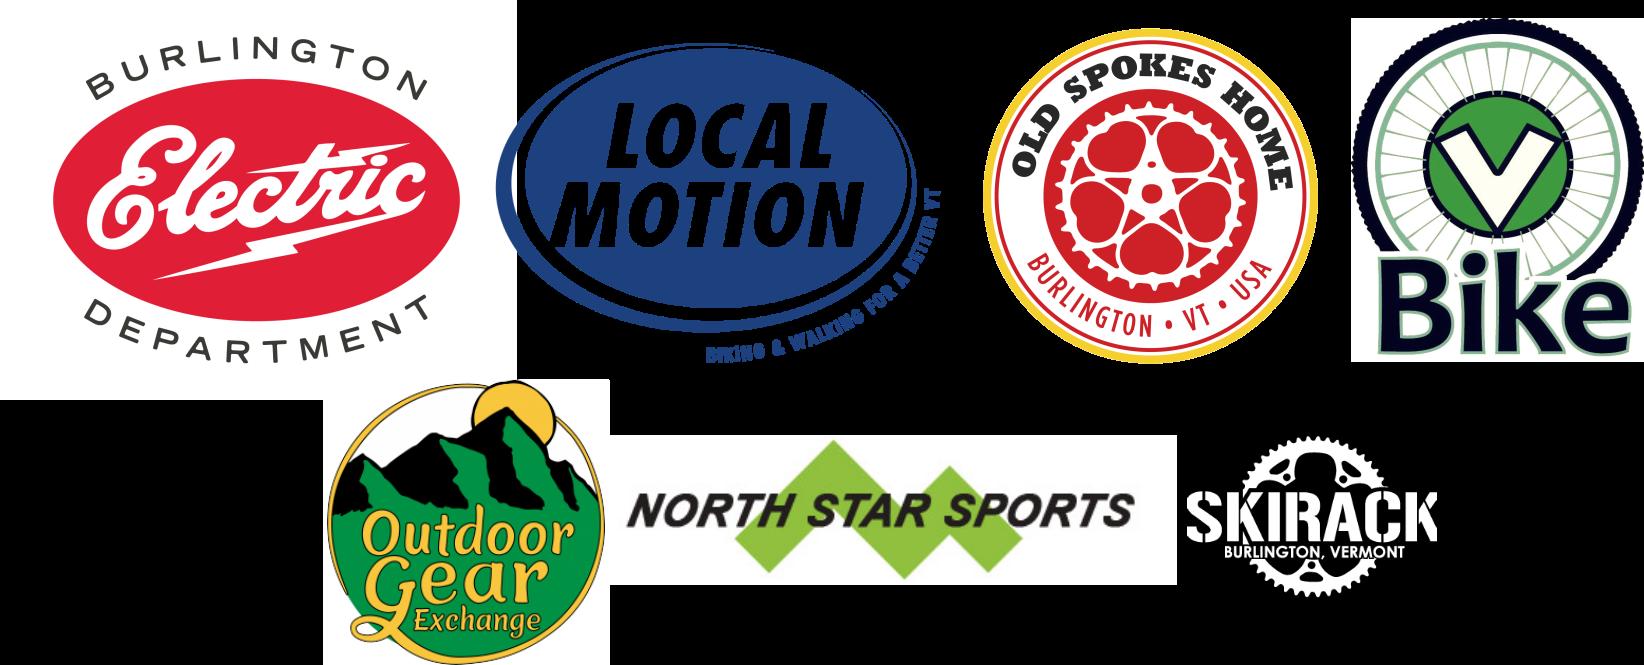 press-release-logos.png